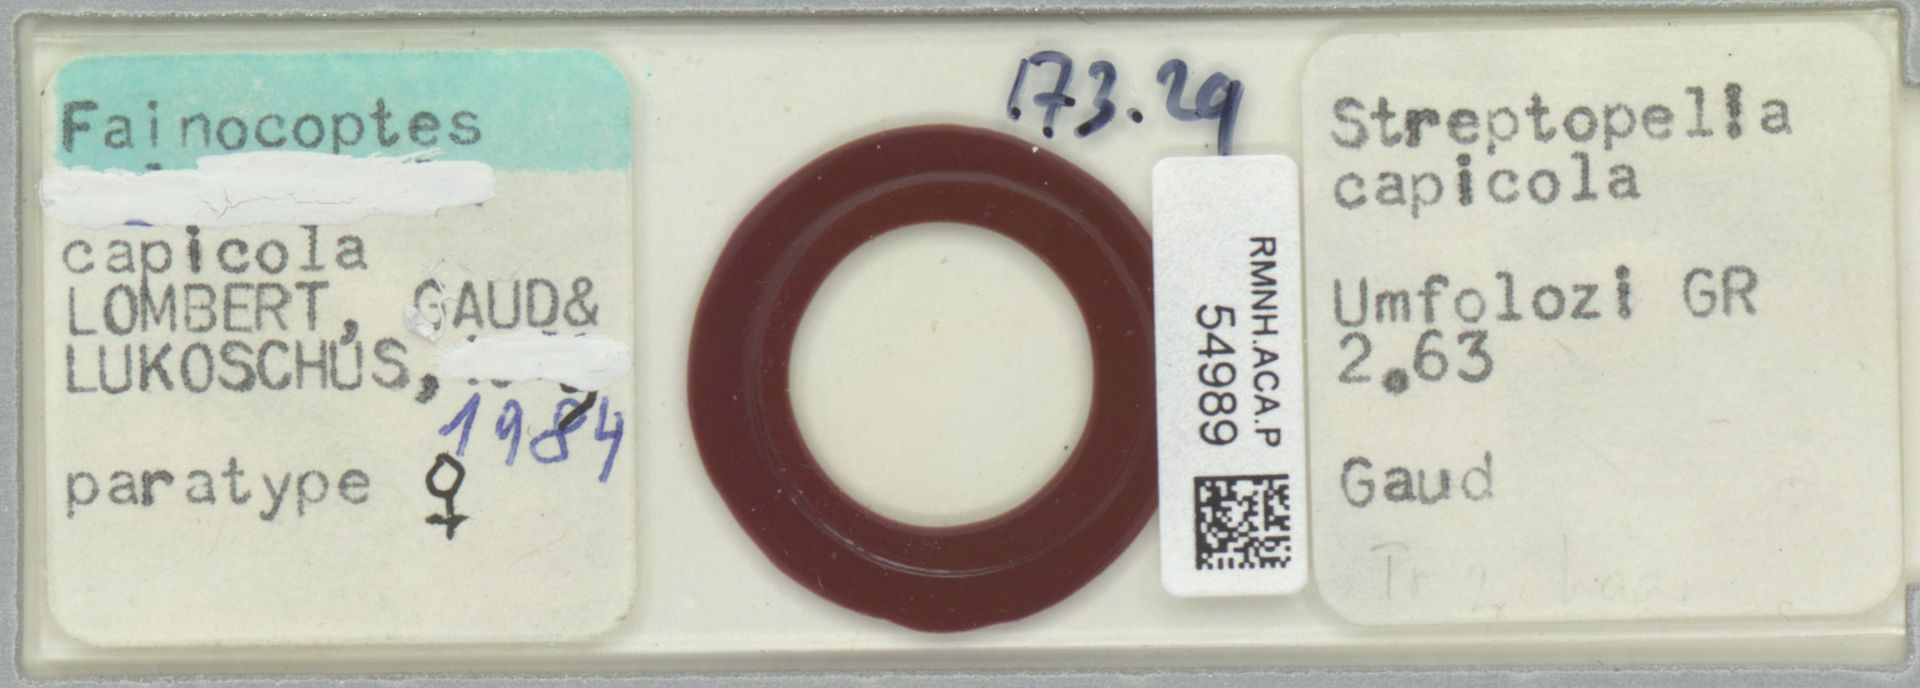 RMNH.ACA.P.54989 | Fainocoptes capicola Lombert, Gaud & Lukoschus, 1984